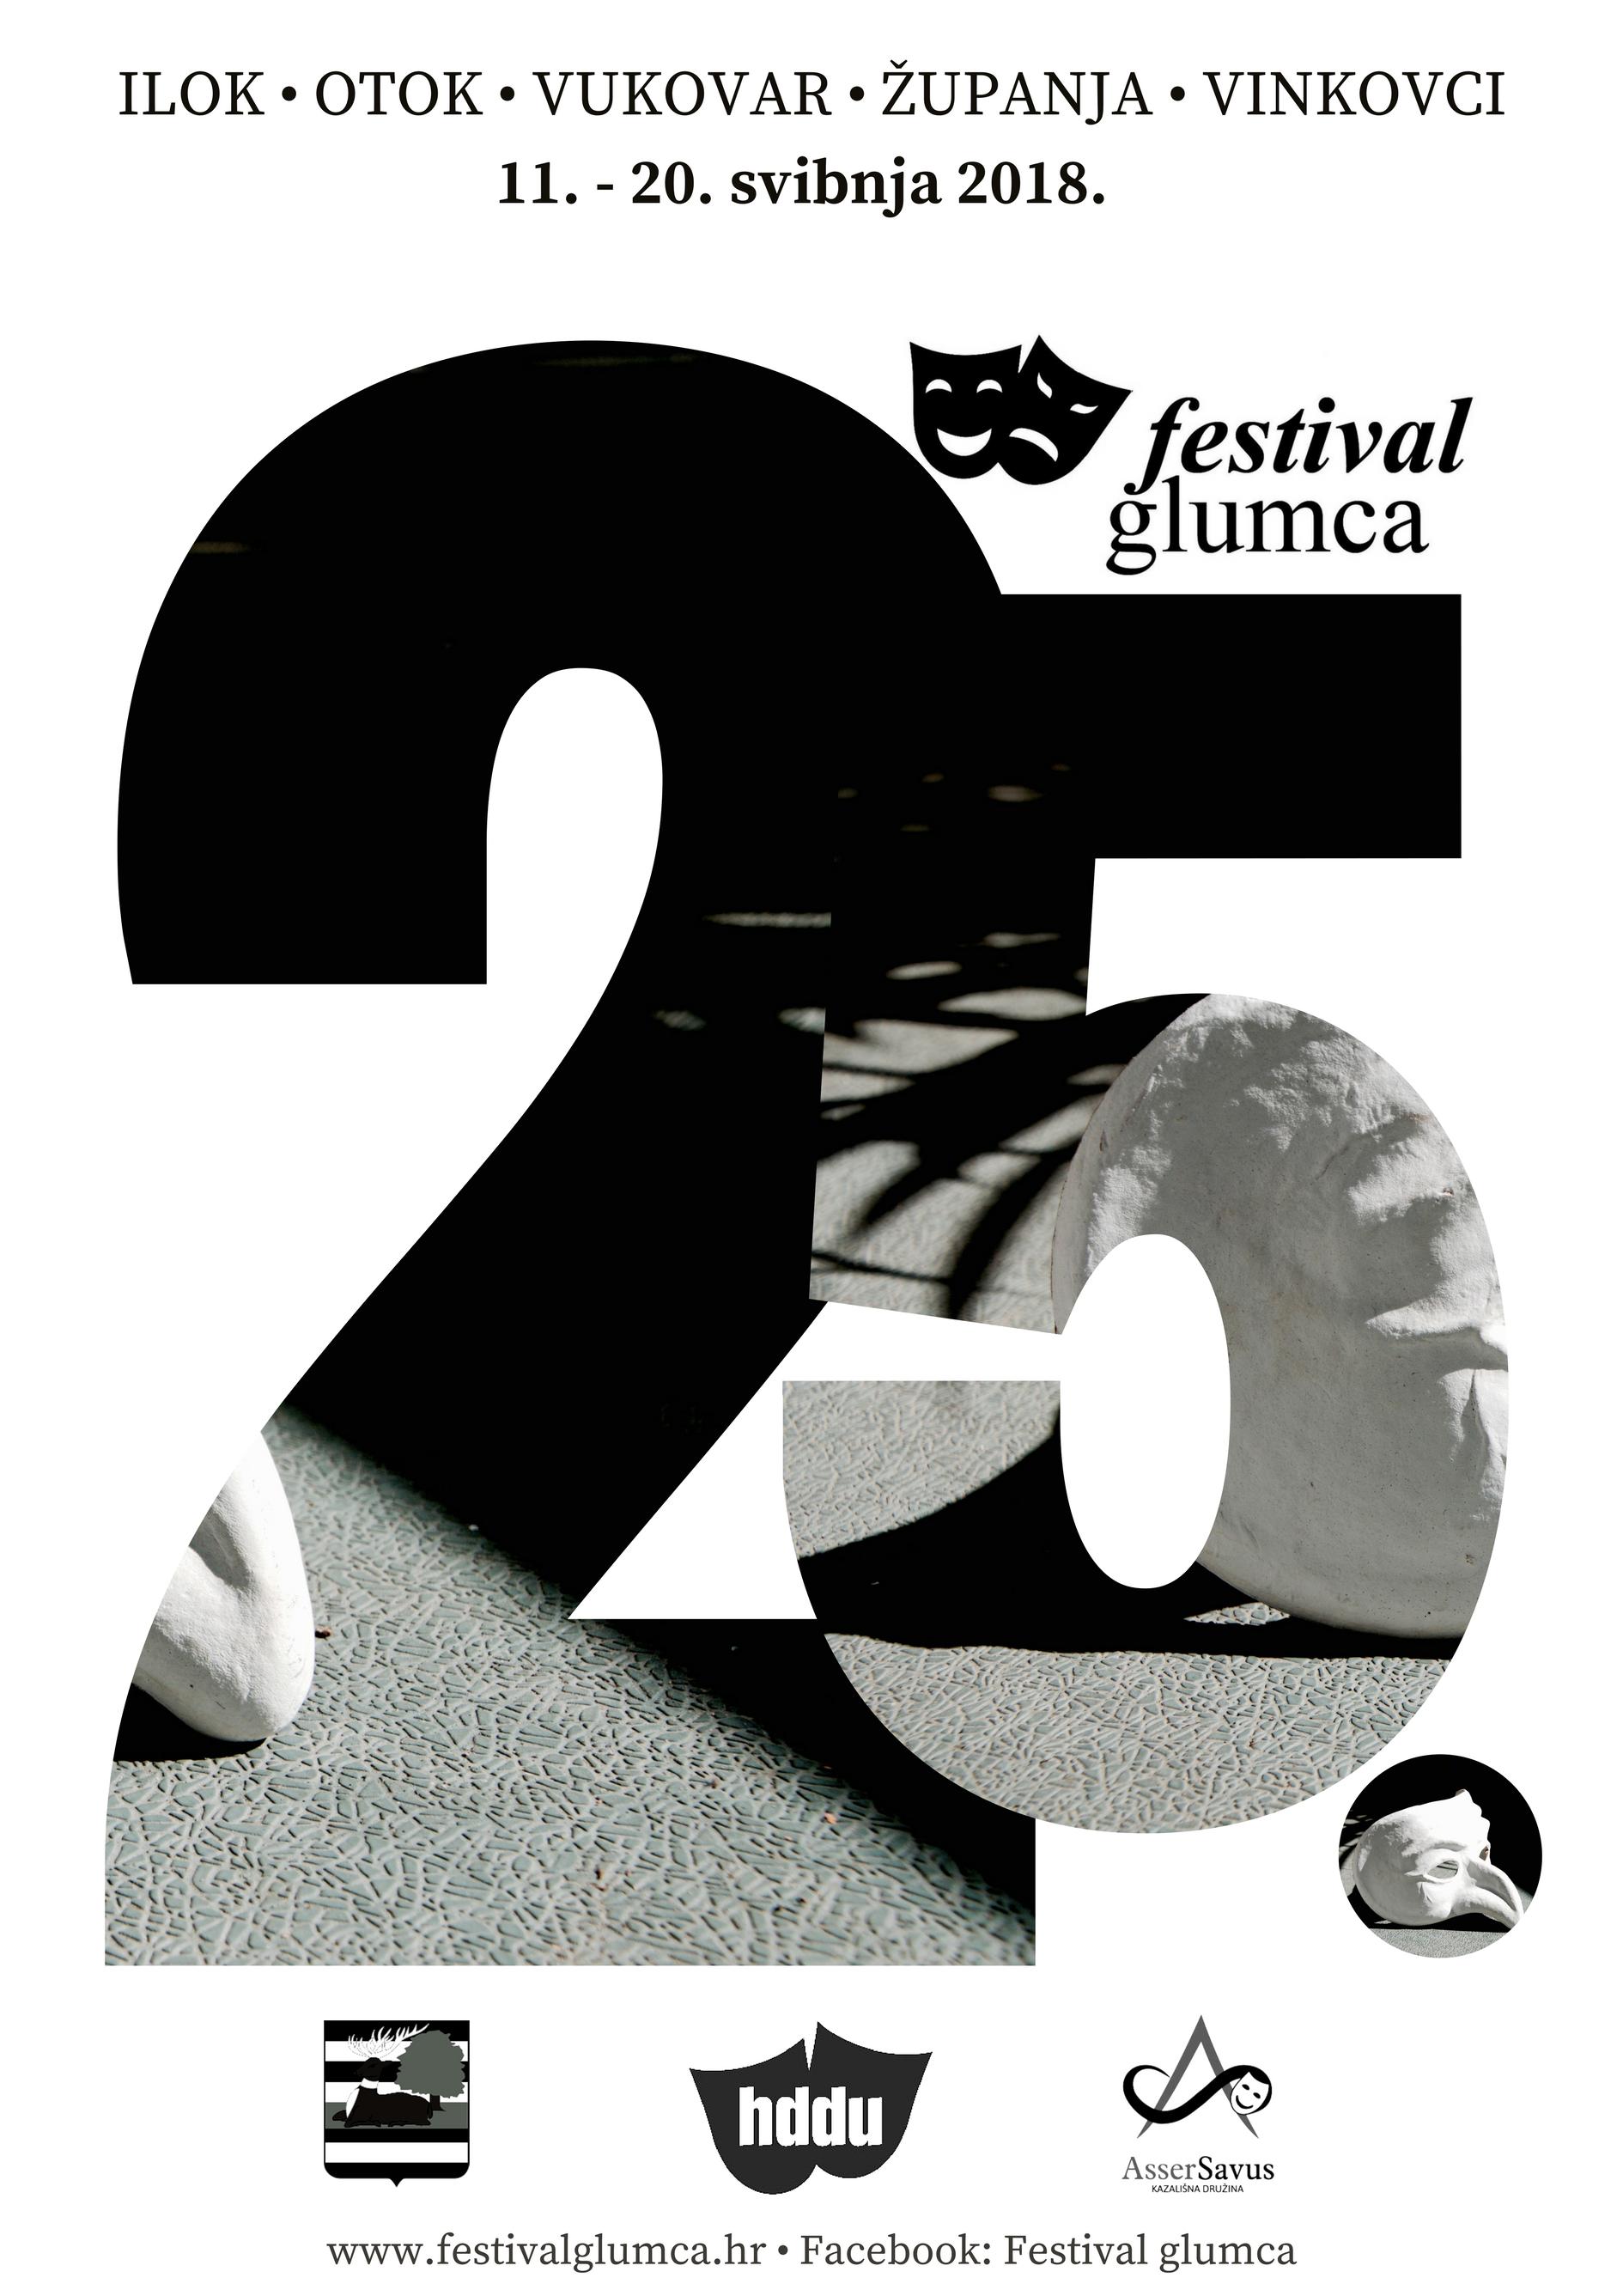 Izabrane predstave za 25. festival glumca